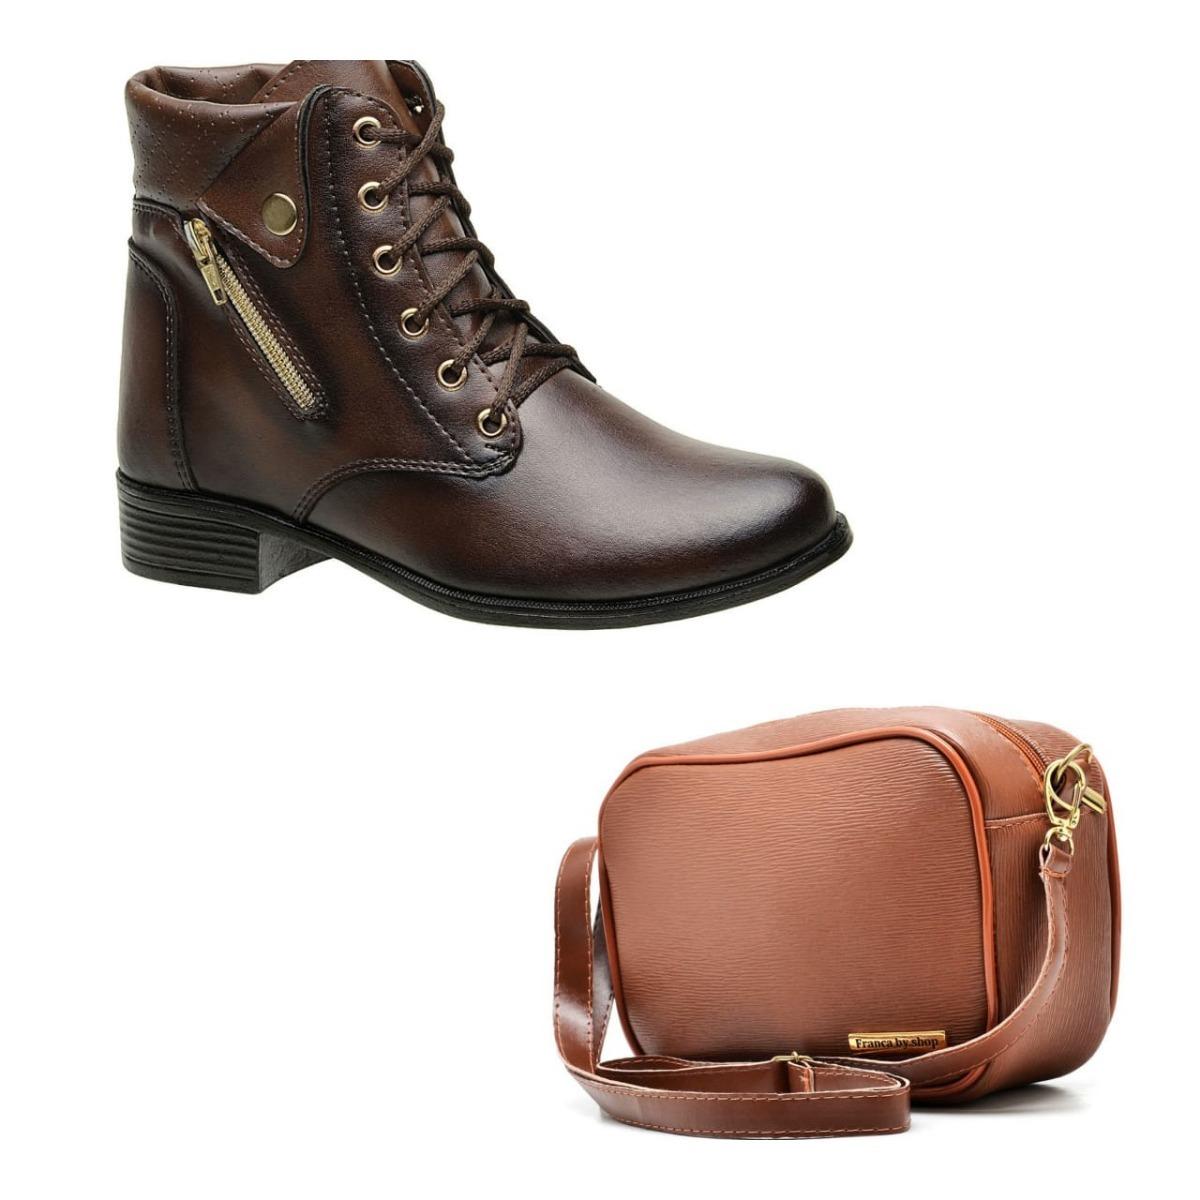 7b215a899 bota feminina coturno cano curto + bolsa mini bag kit top. Carregando zoom.